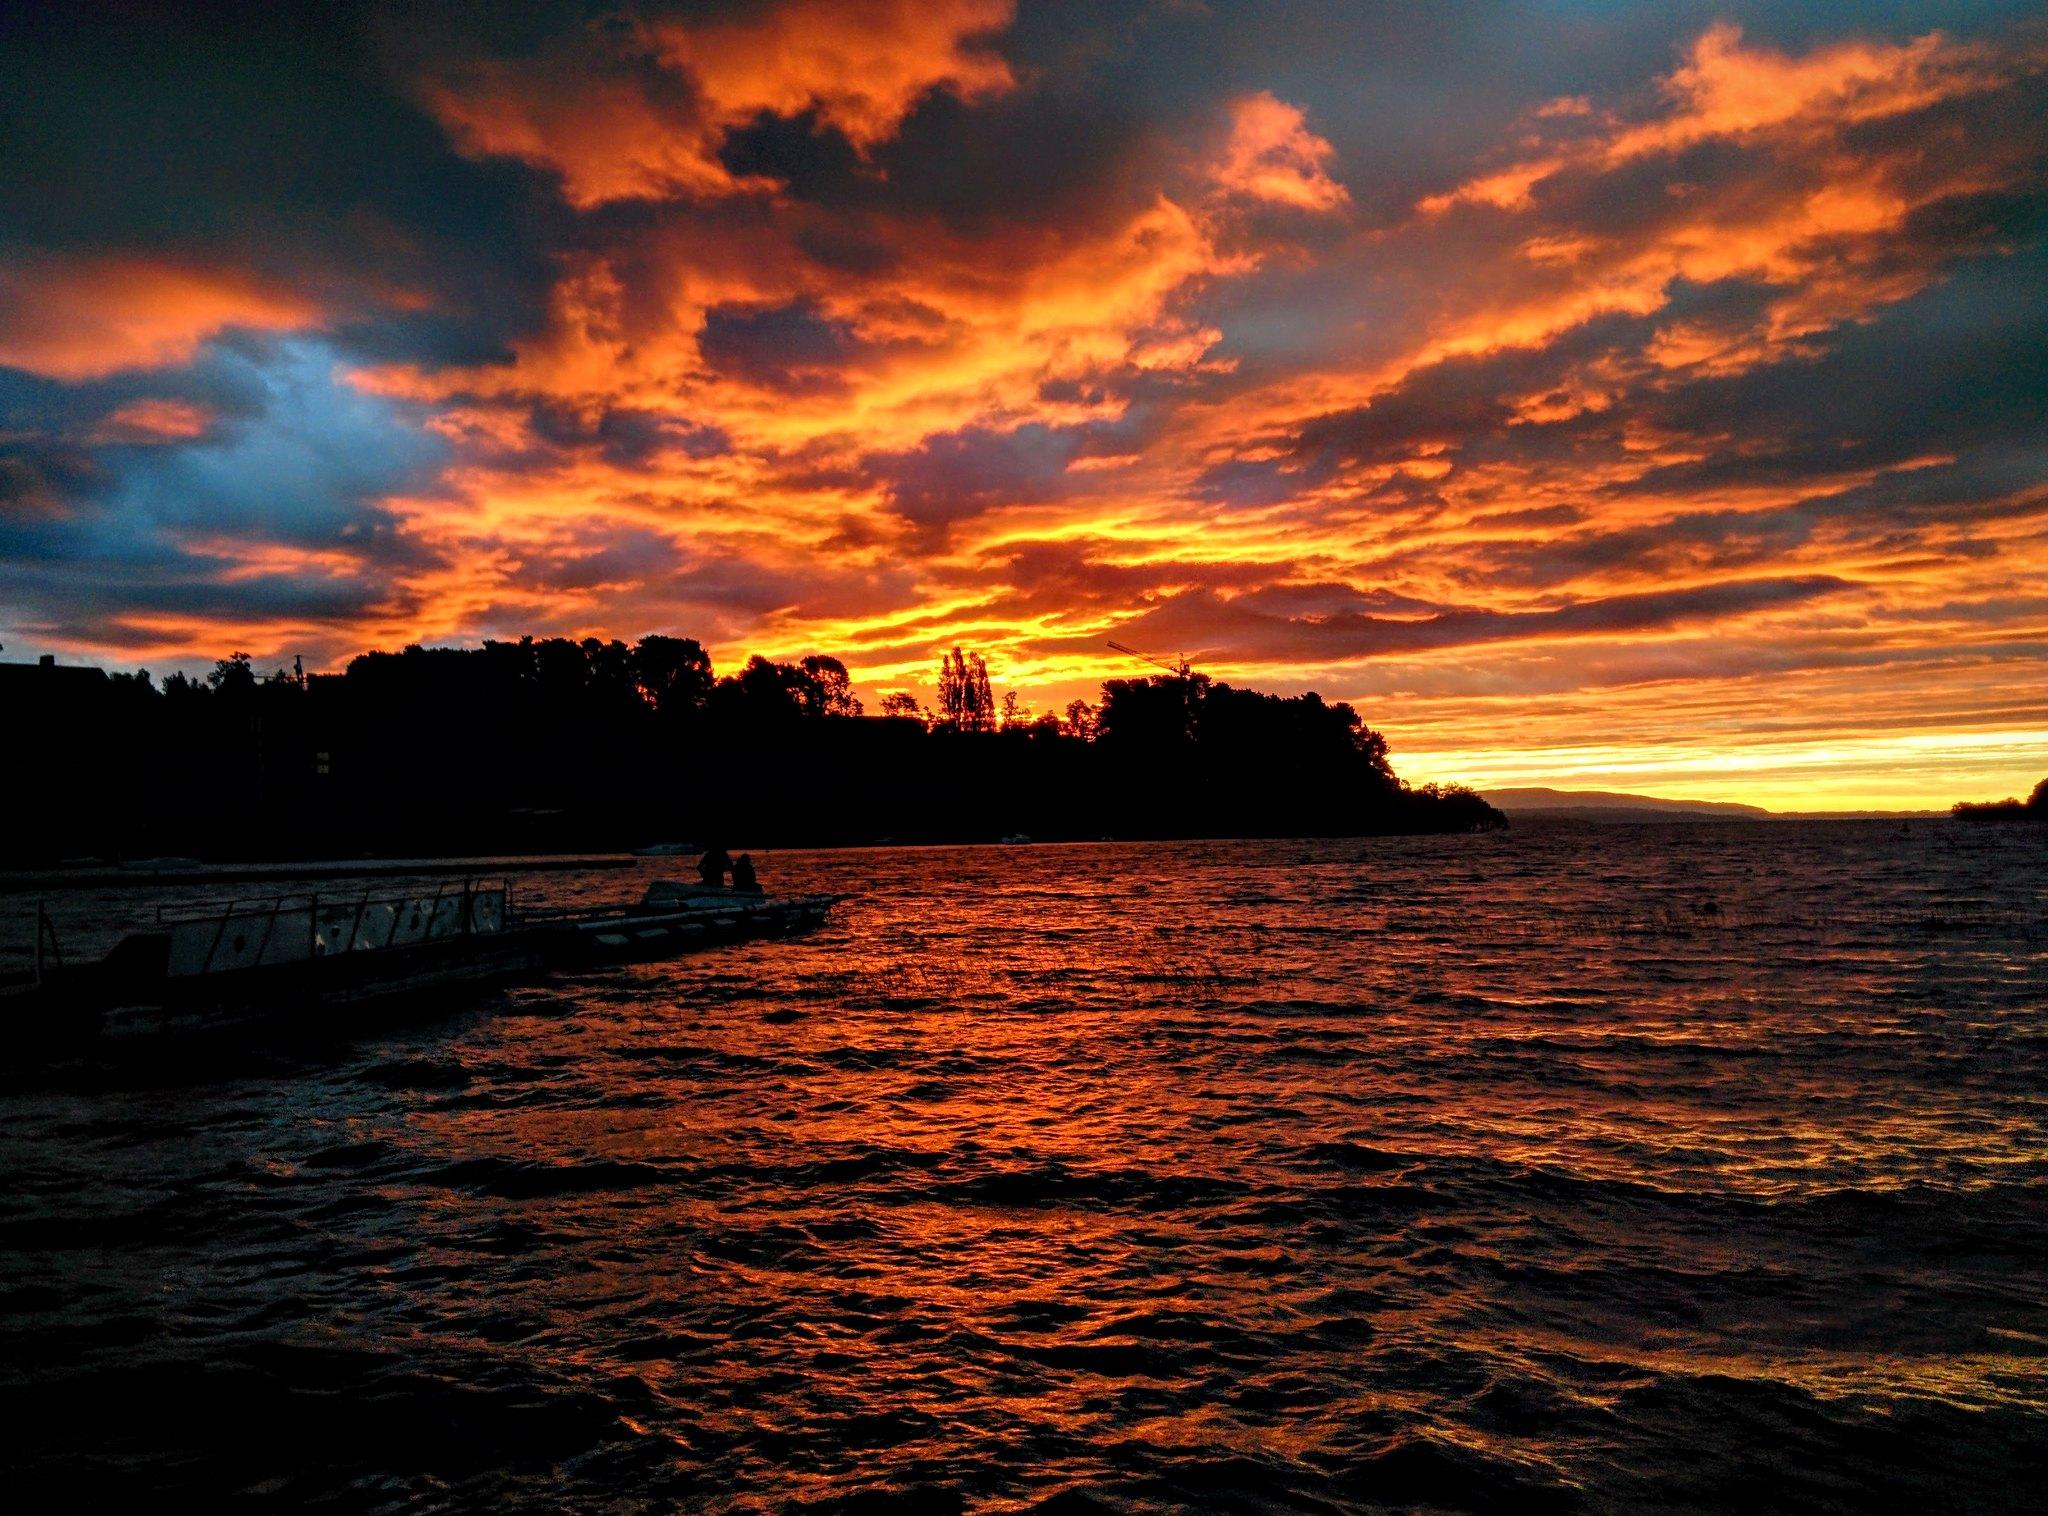 Vivid orange sunset over lake Lago Villarrica (from previous night)